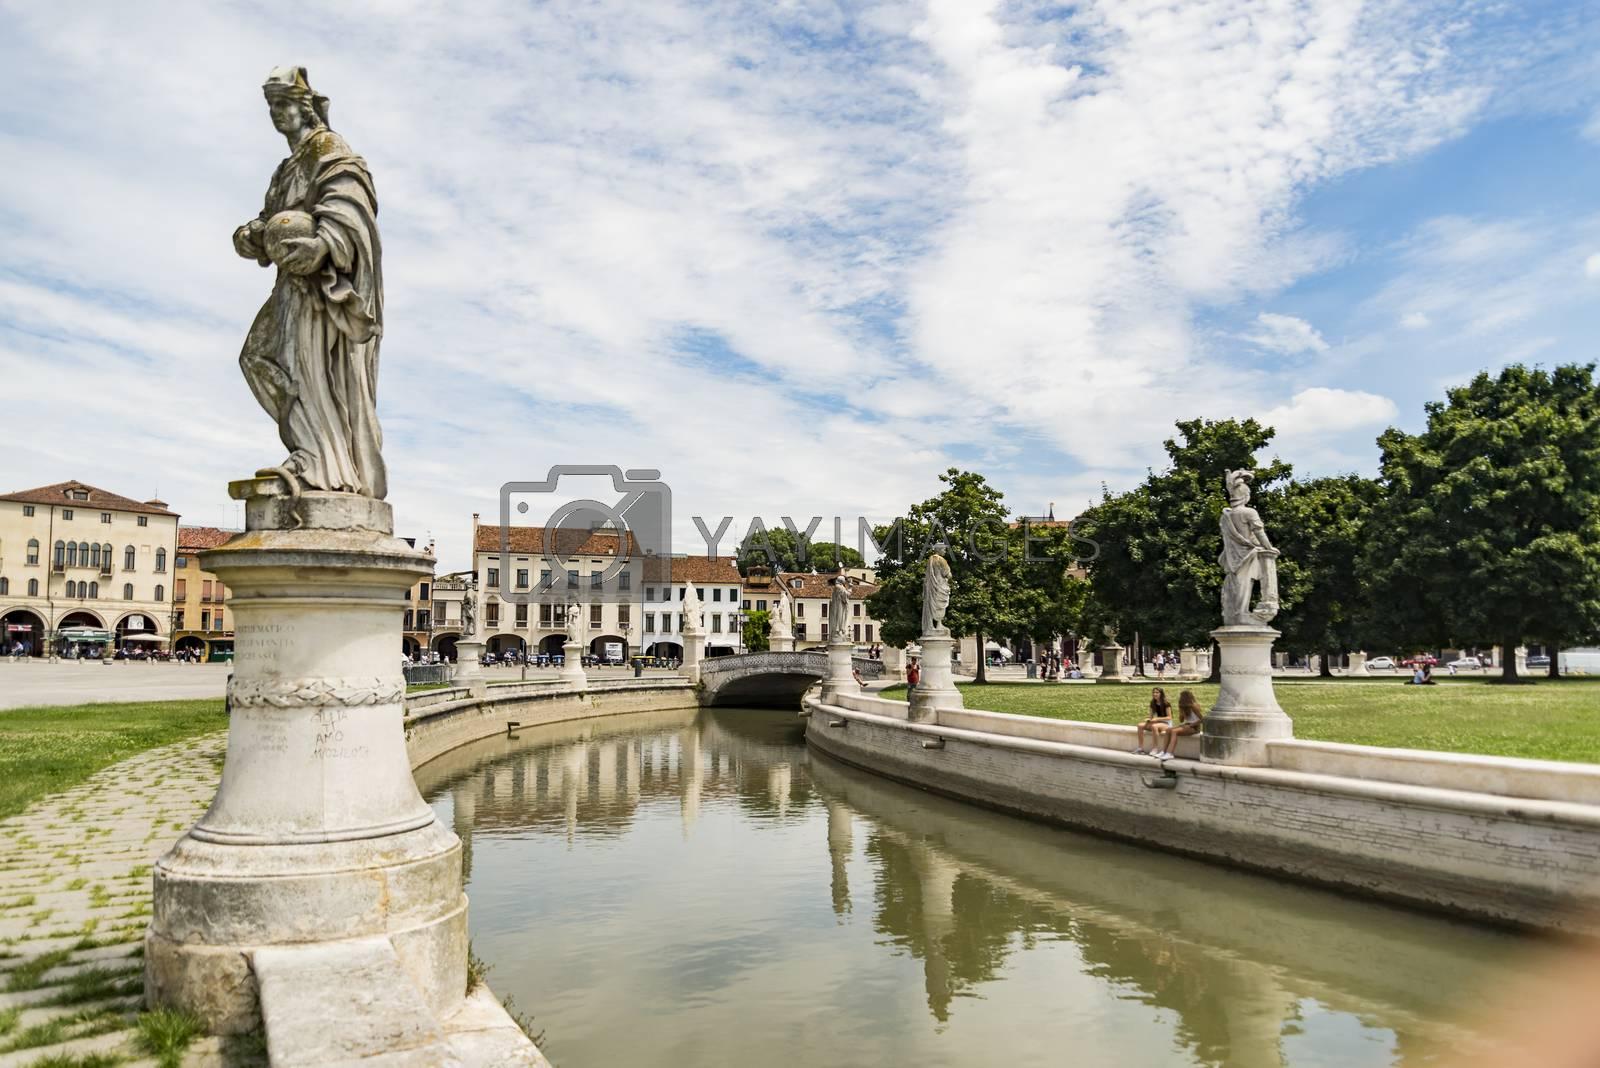 the oval canal arounf the fountain in Prato della Valle in Padua, Italy